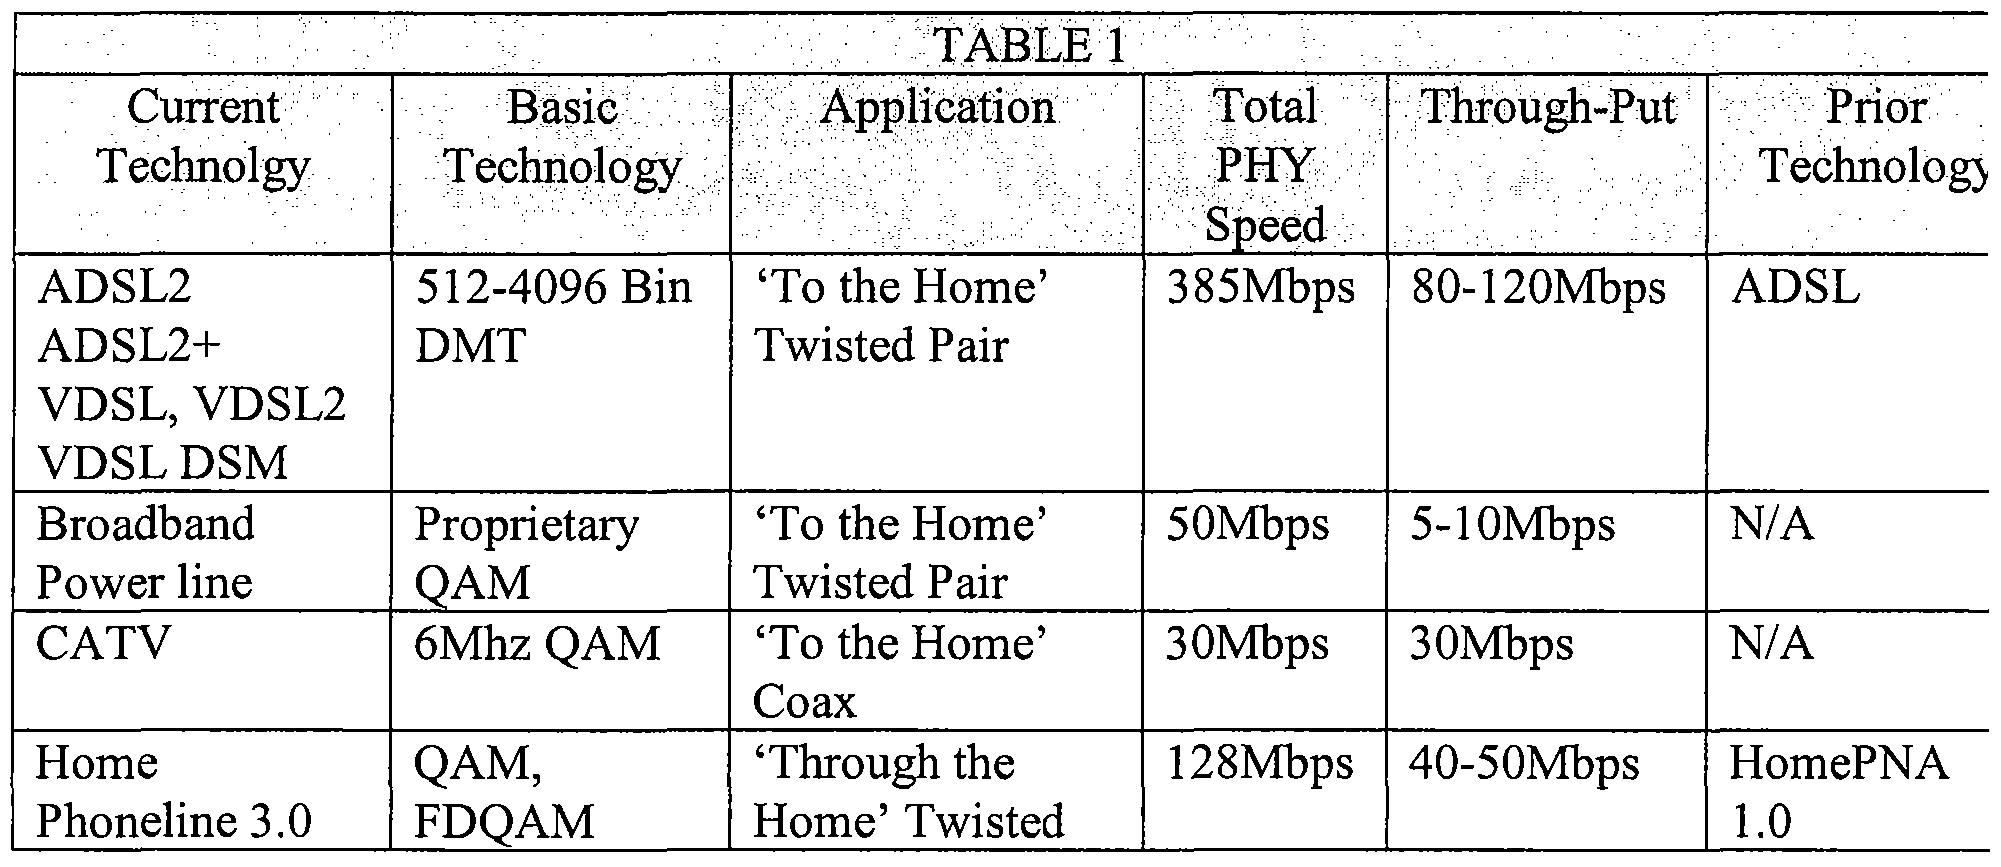 WO2009058149A1 - Improved high bandwidth data transport